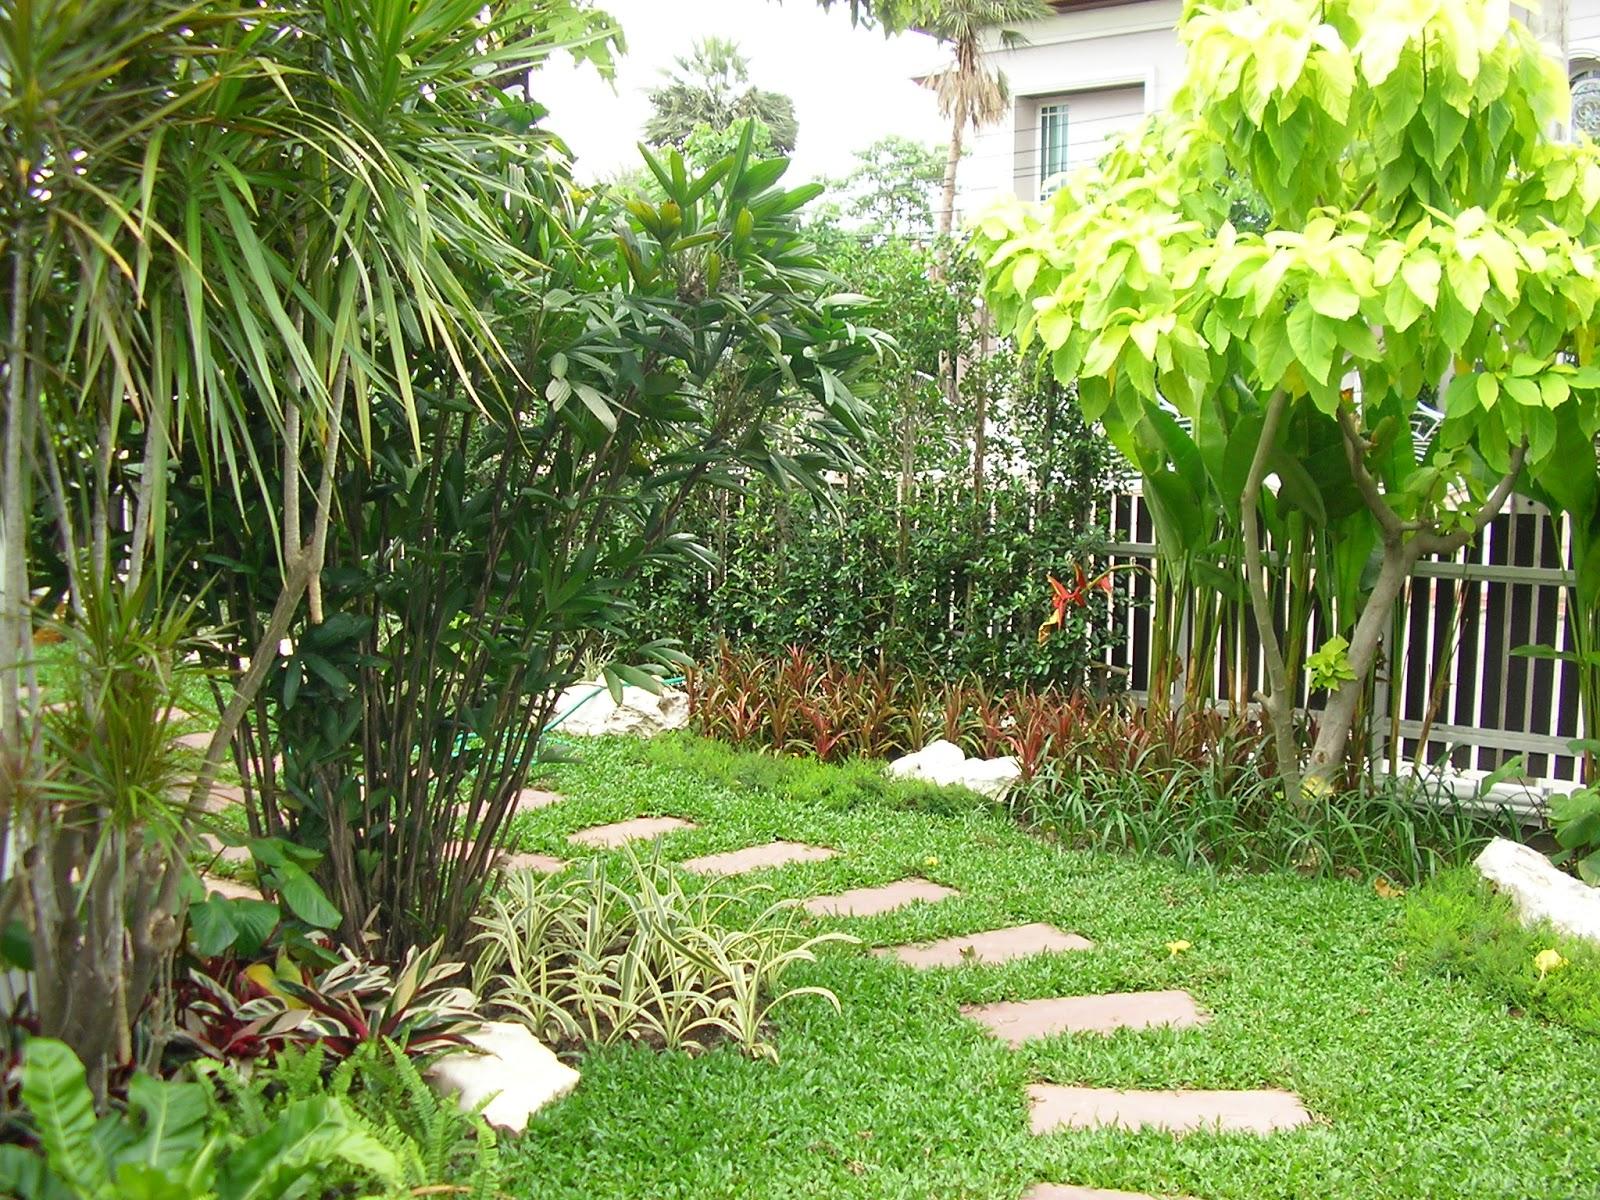 Residential Landscaping Plants : Gardensiam residential landscape design